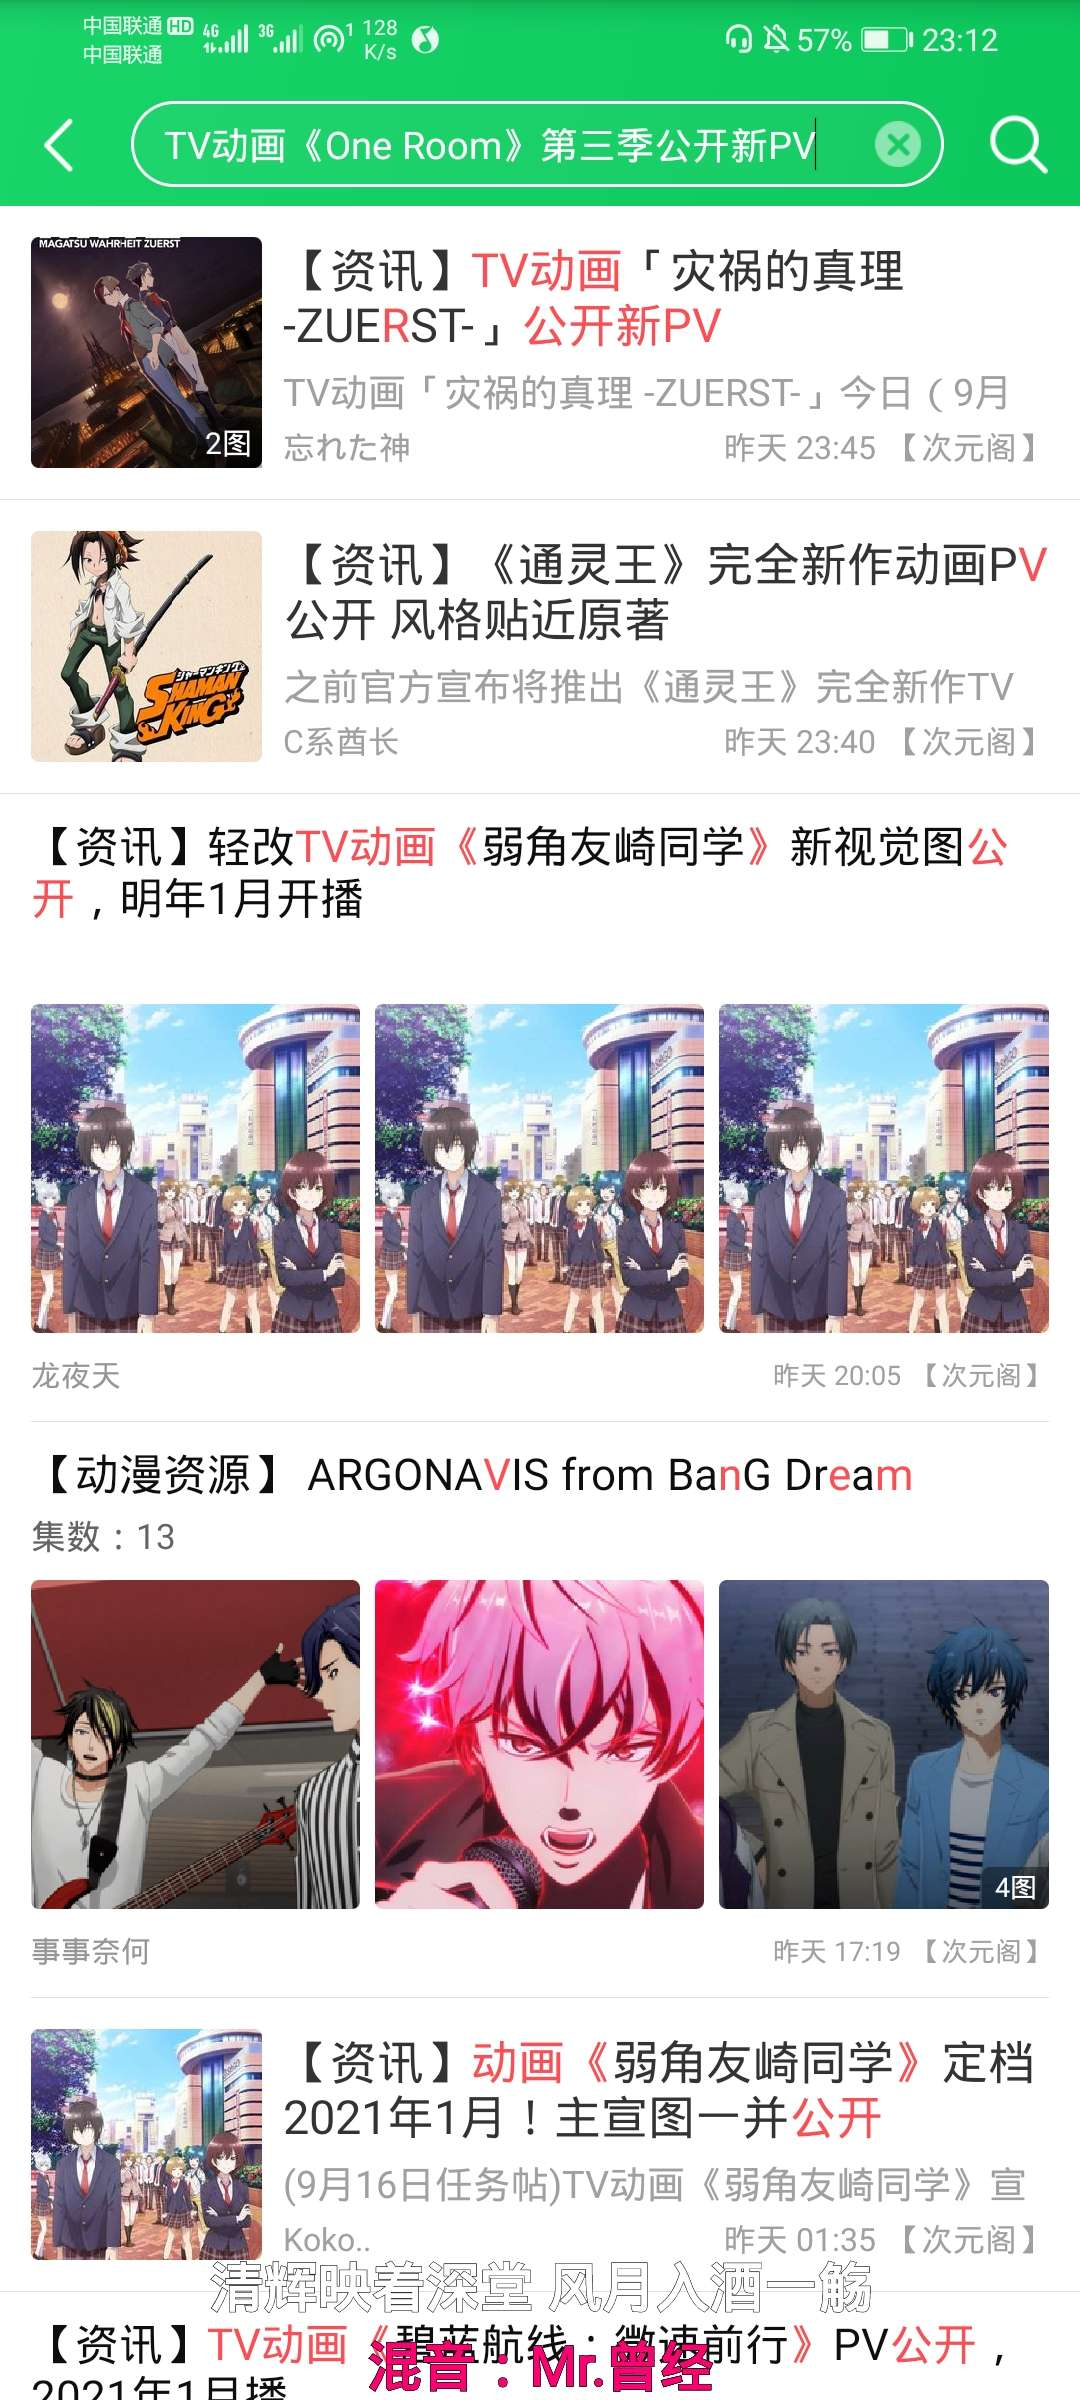 【资讯】TV动画《One Room》第三季公开新PV